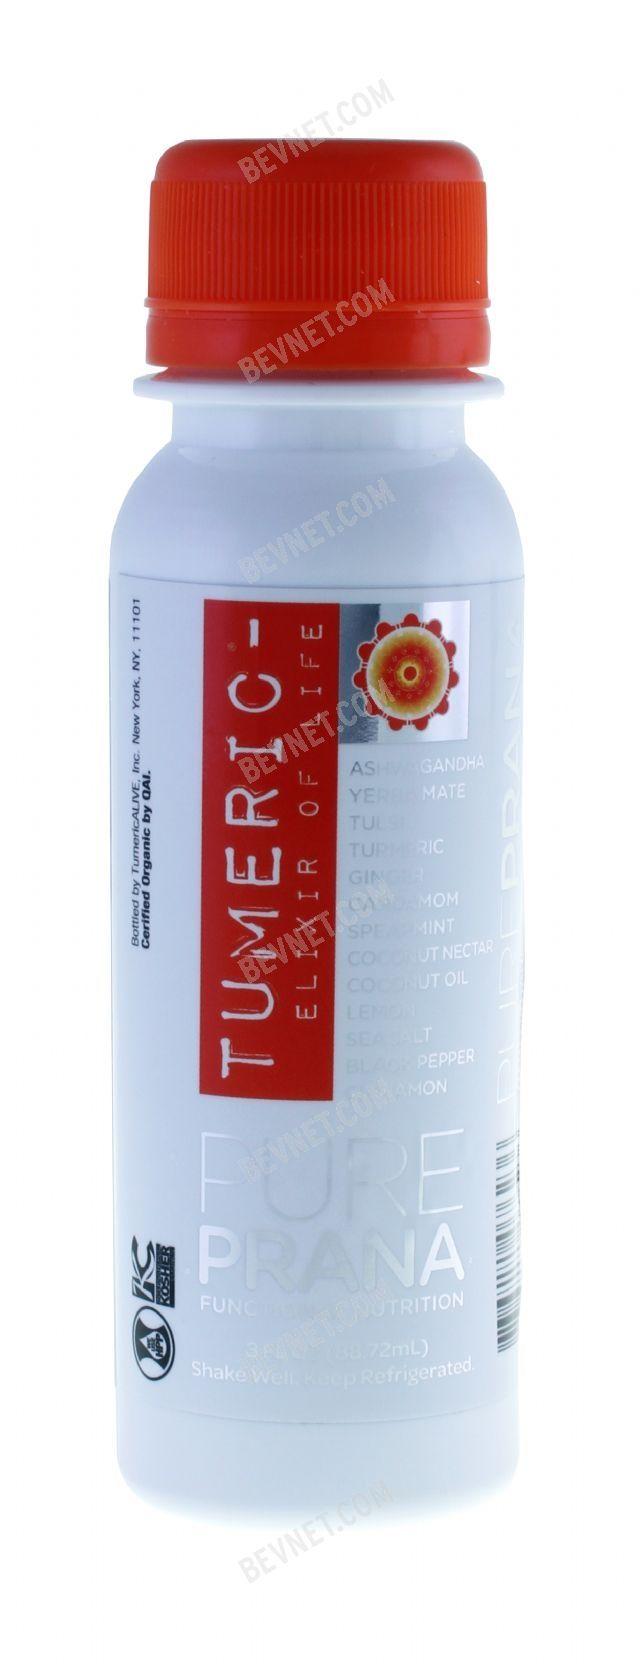 Tumeric - The Elixir of Life: